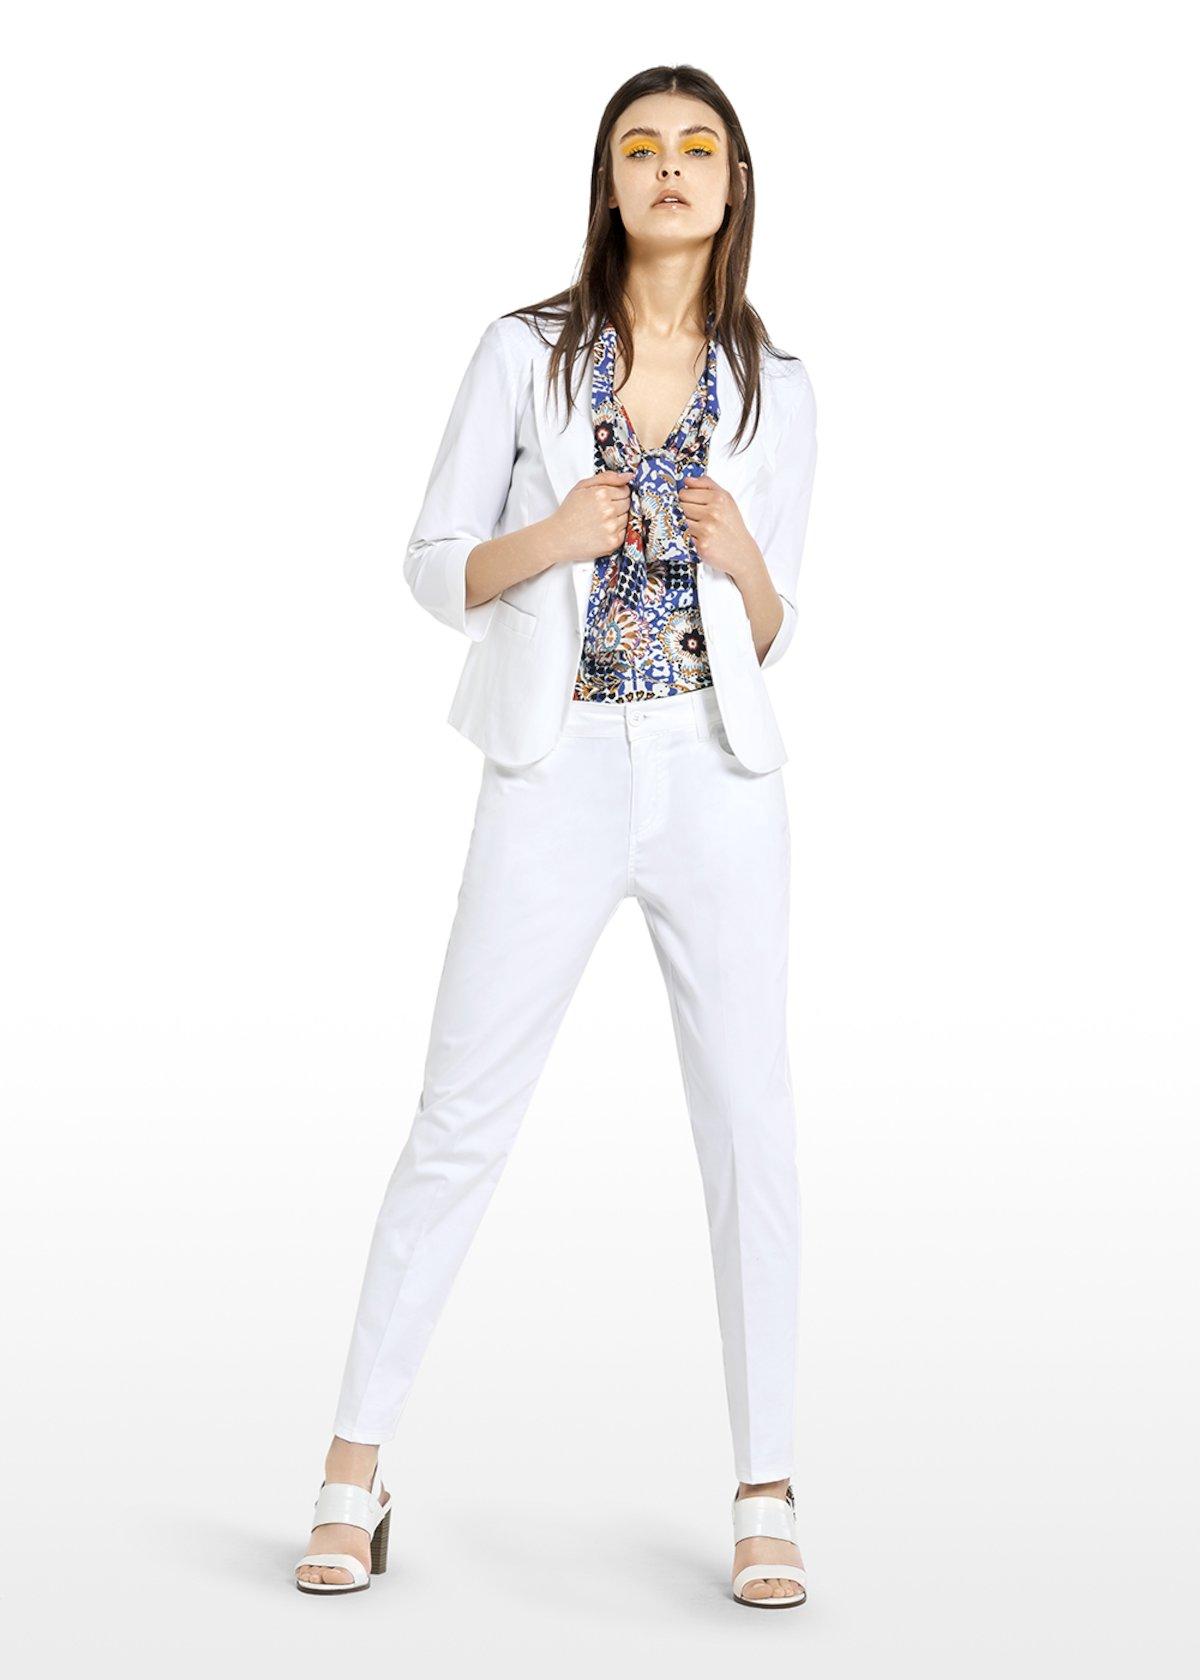 Ginevra Long sleeve couger jacket - White - Woman - Category image